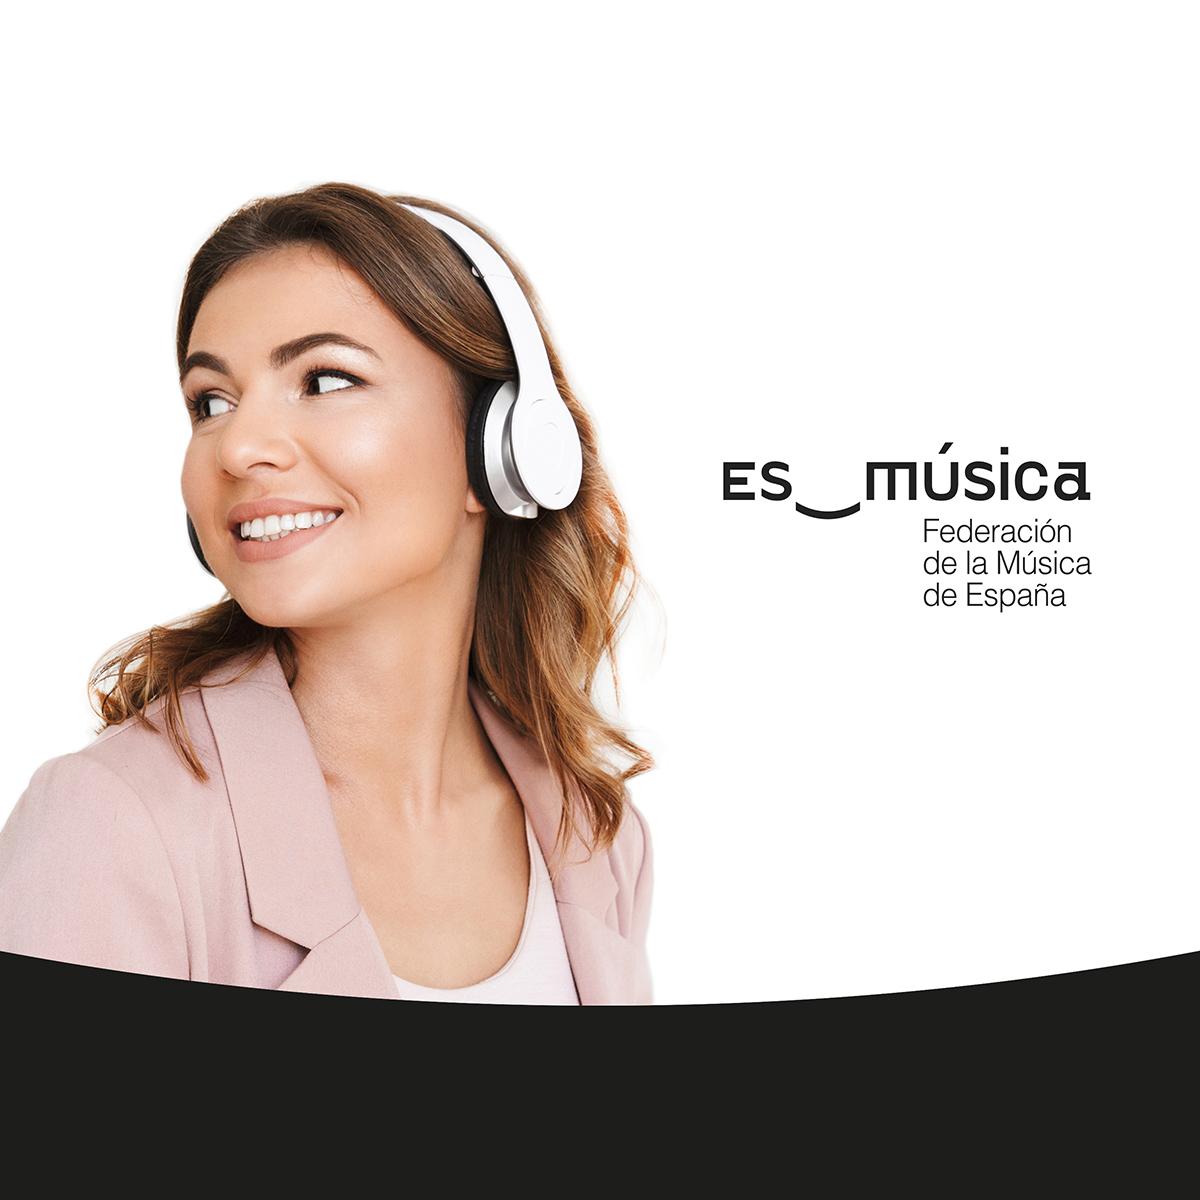 imagen destacada es musica